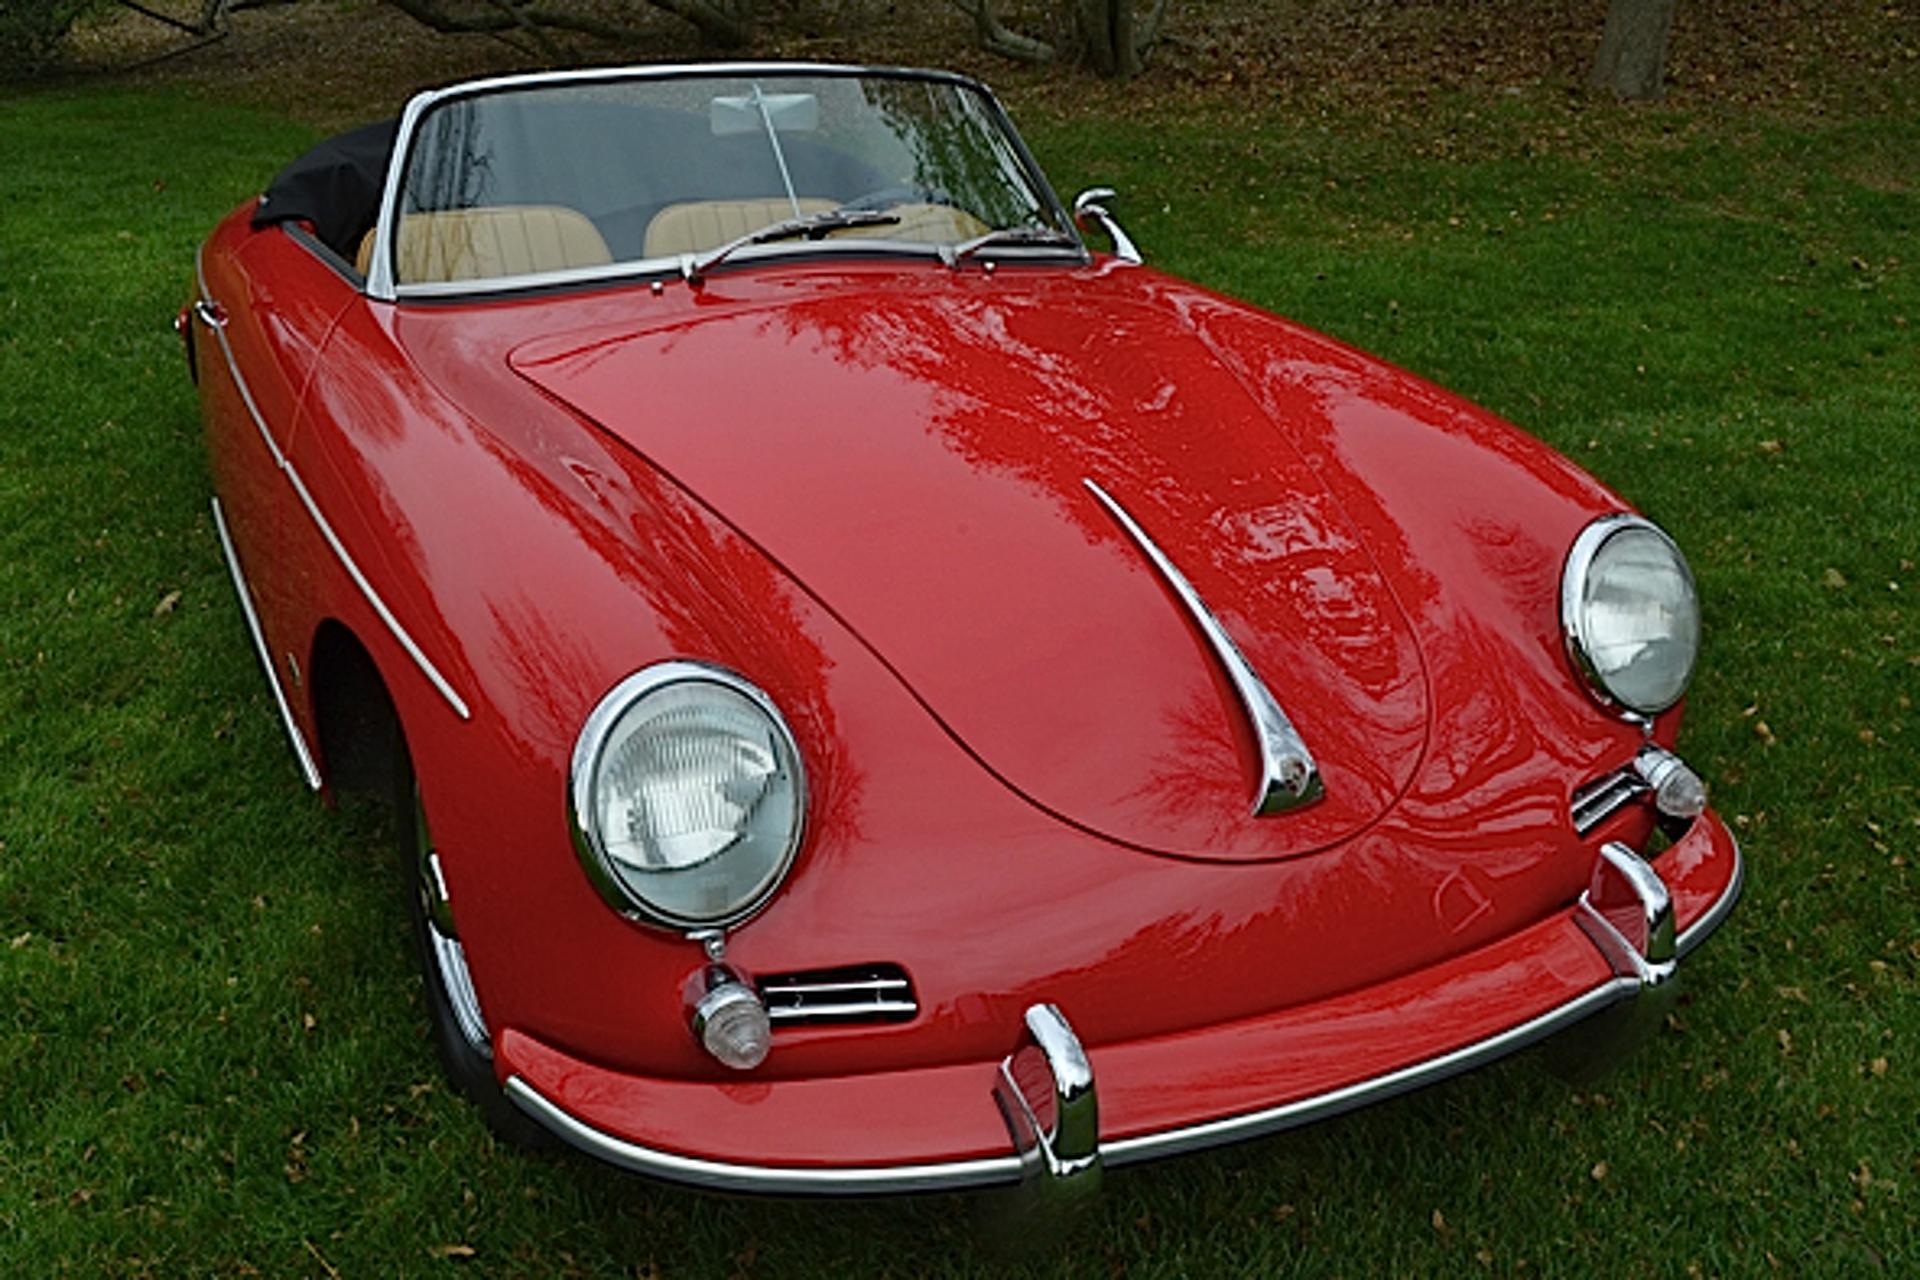 eBay Car of the Week: 1961 Porsche 356B Roadster